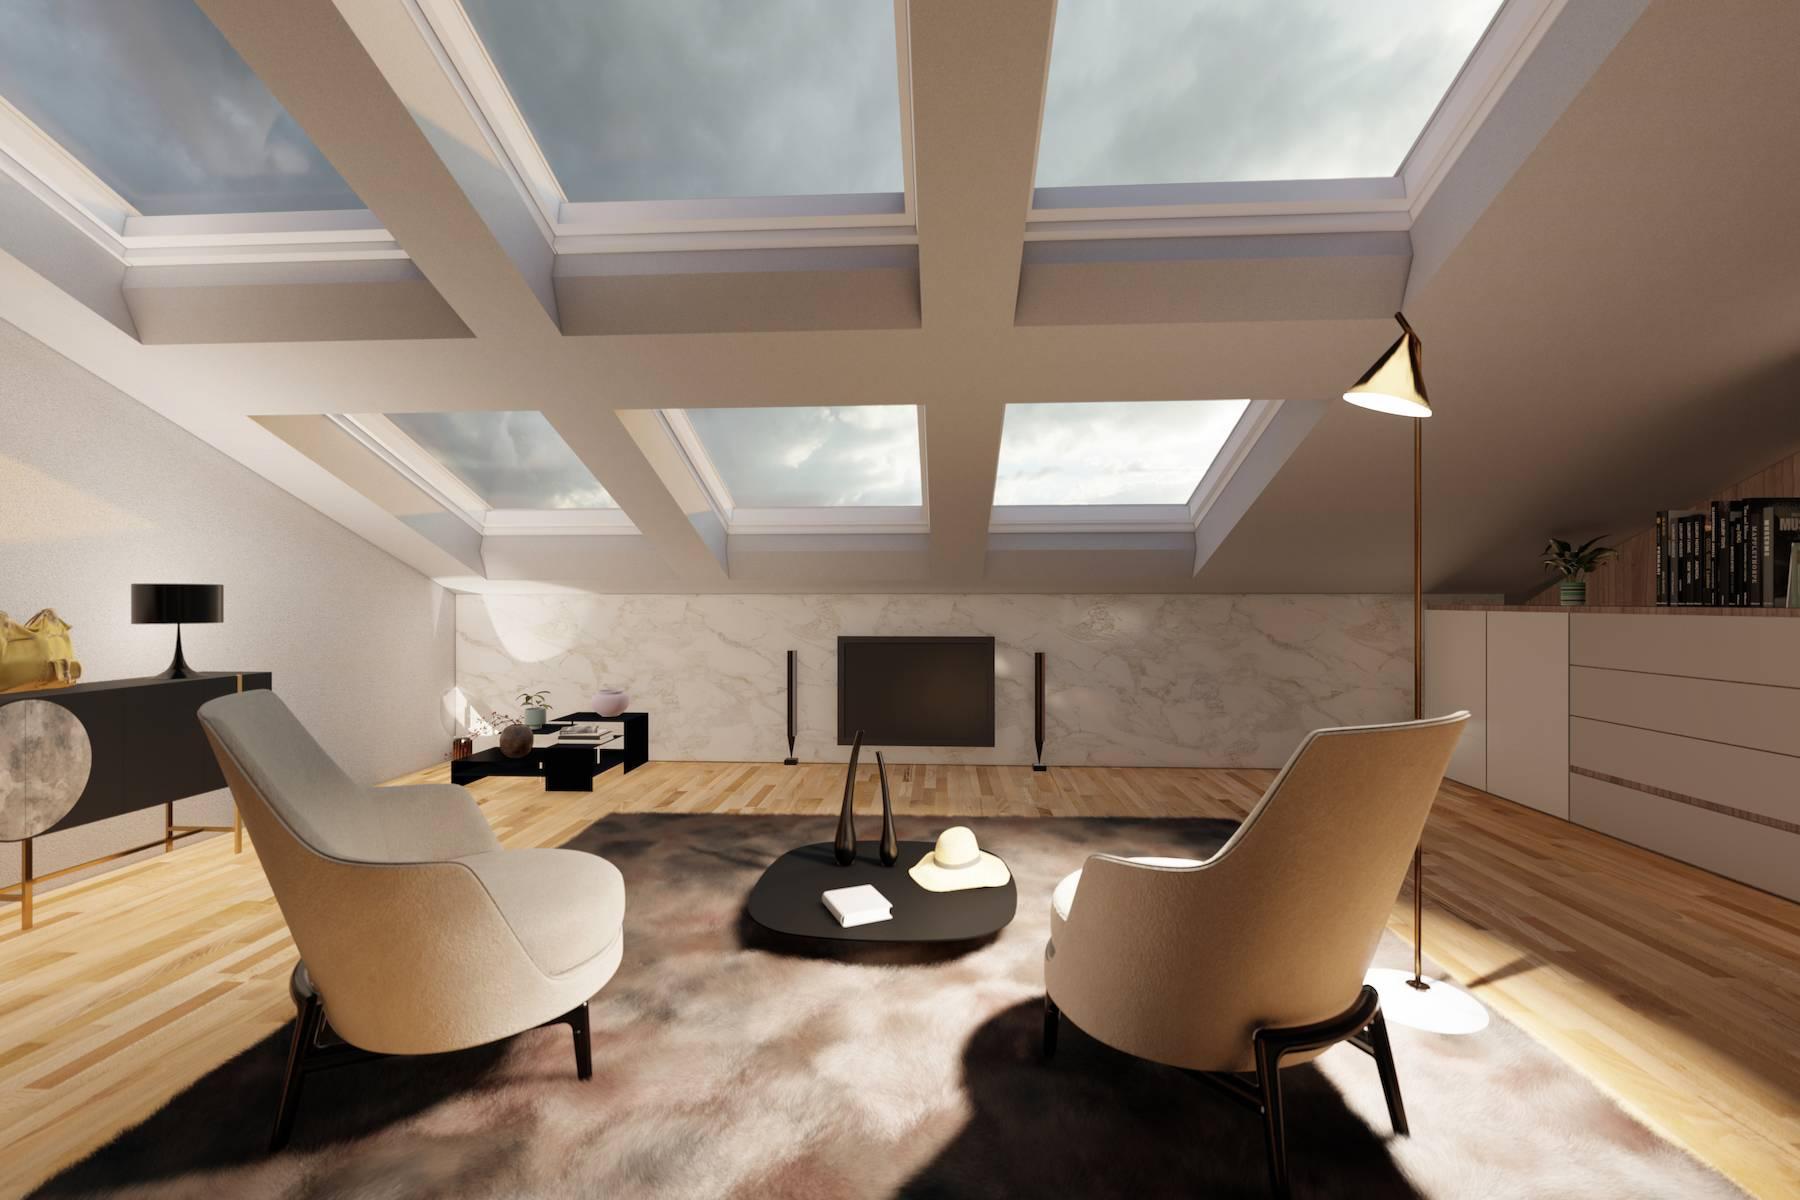 Luxury seafront penthouse in Viareggio - 4